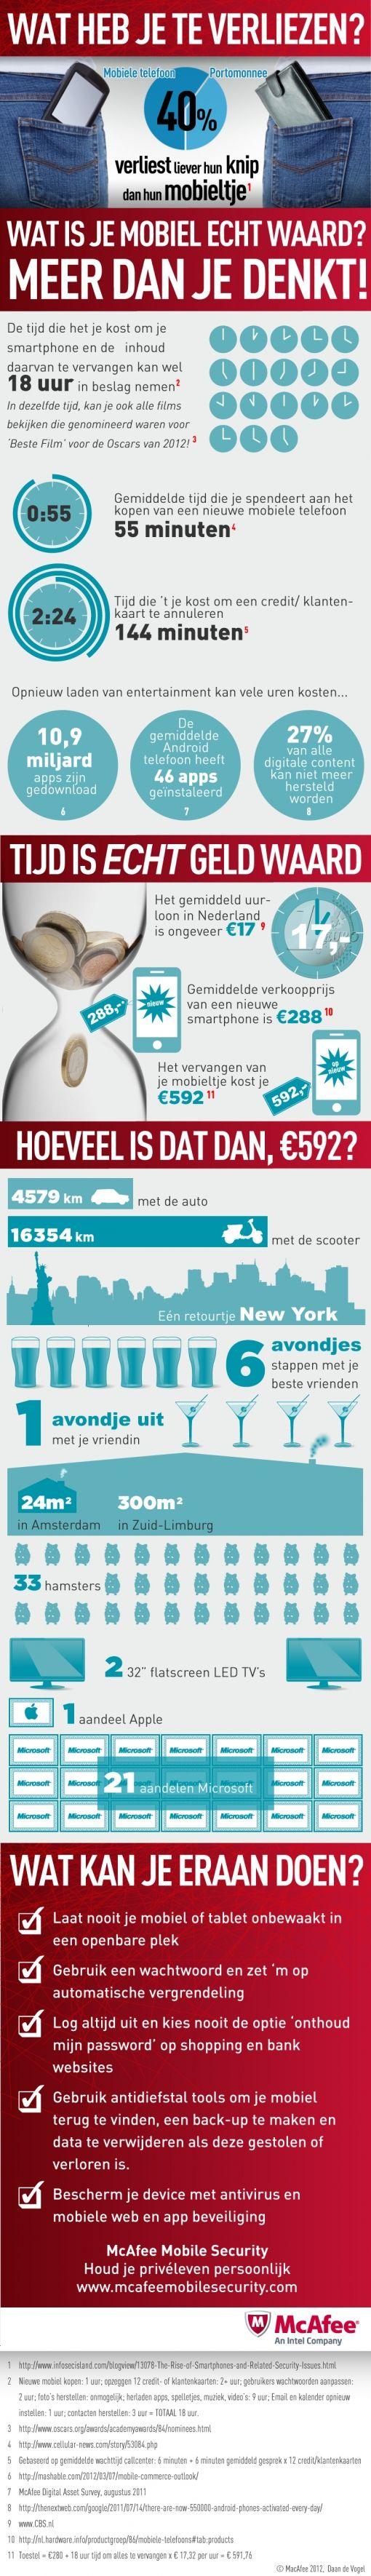 McAfee infographic DEF HR800Pix